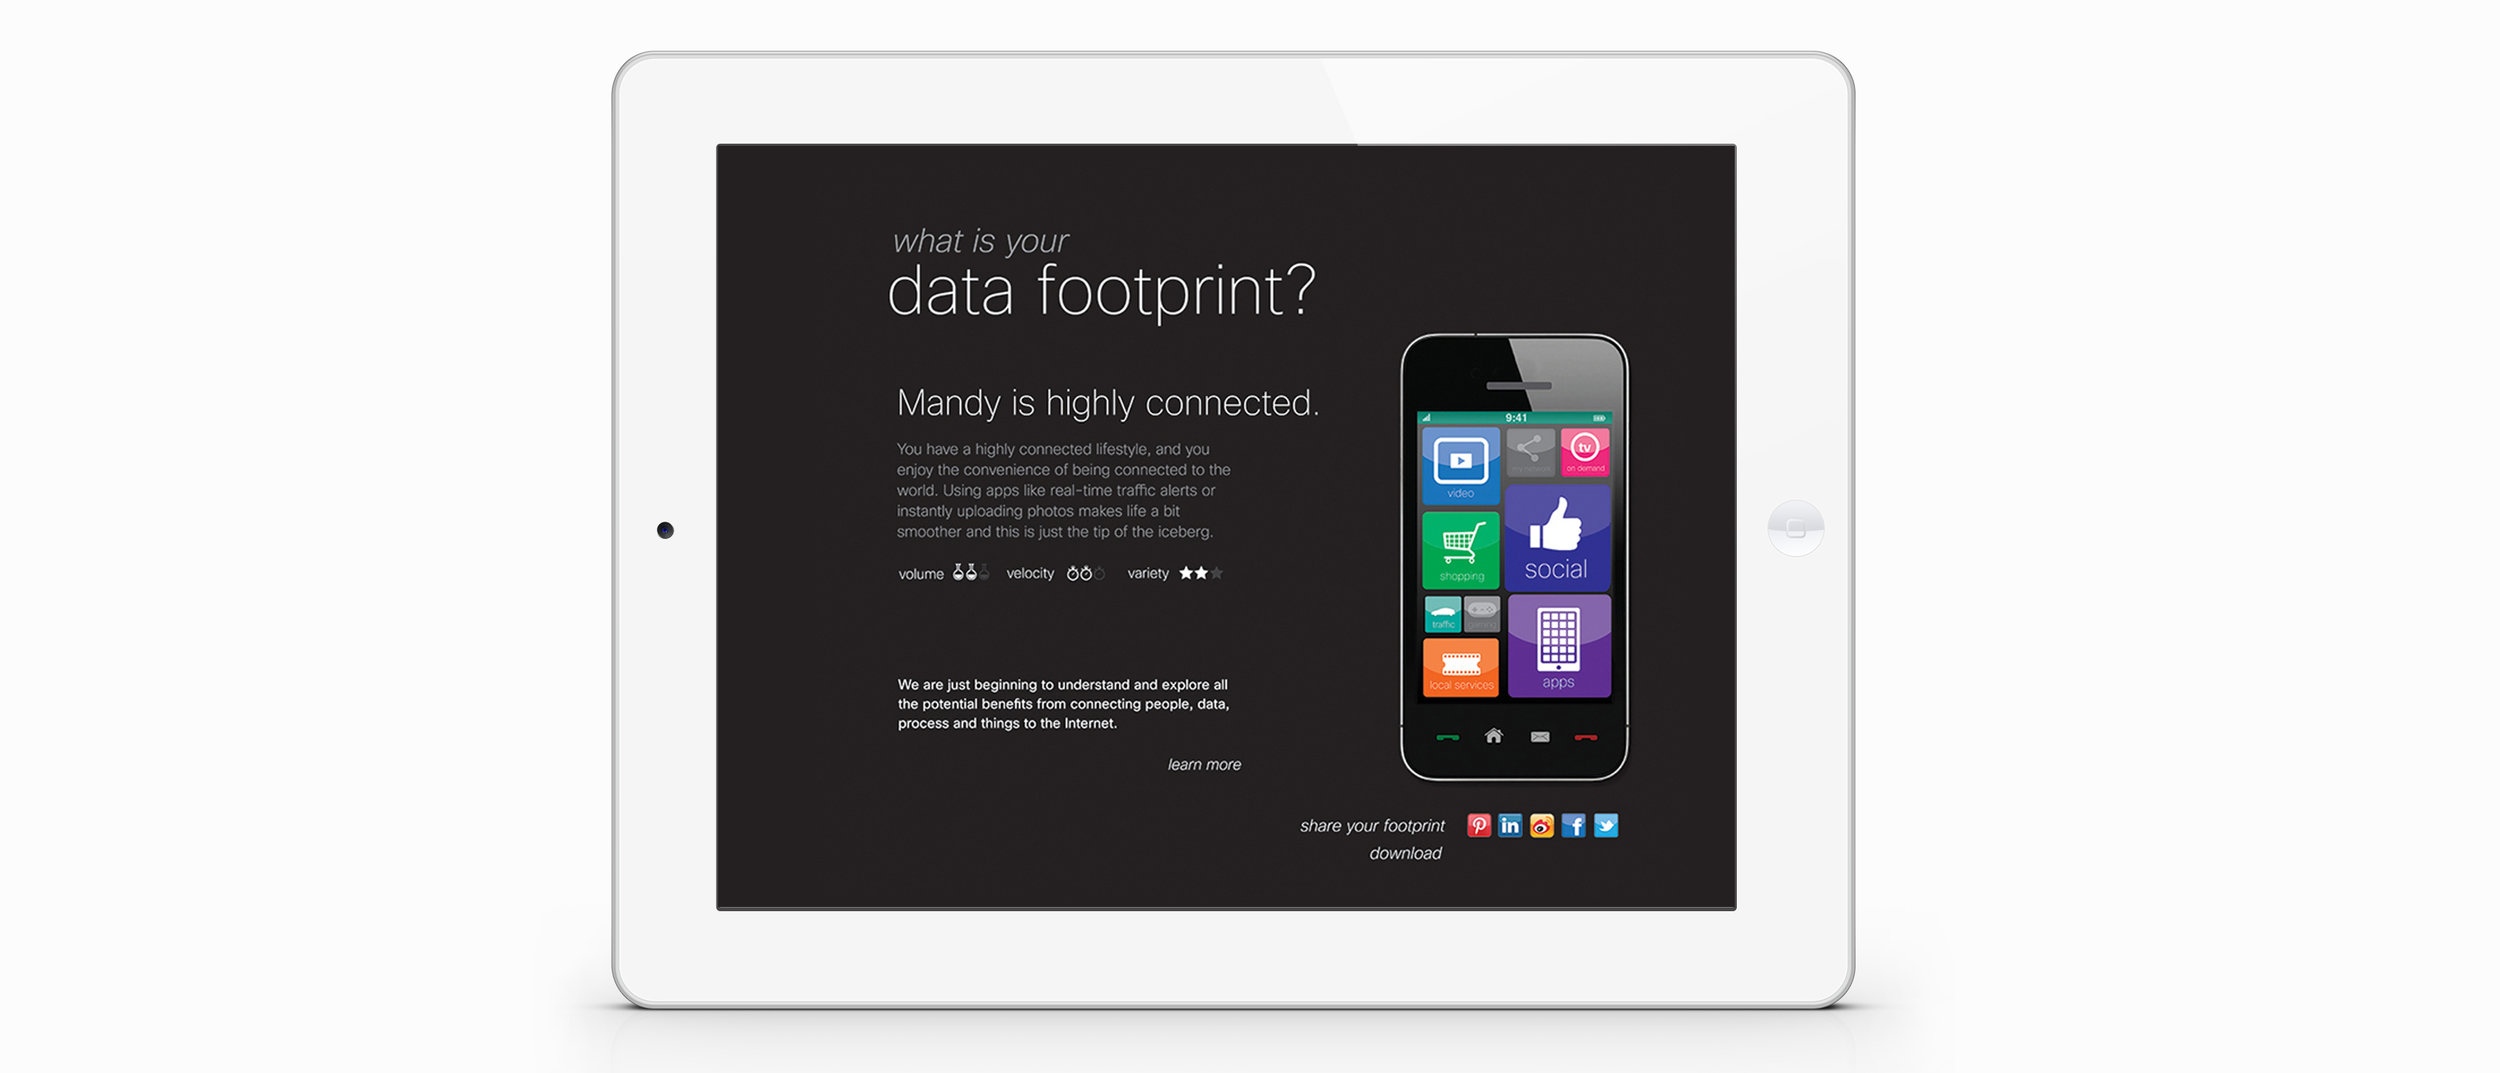 Footprint_iPad_7 copy.jpg